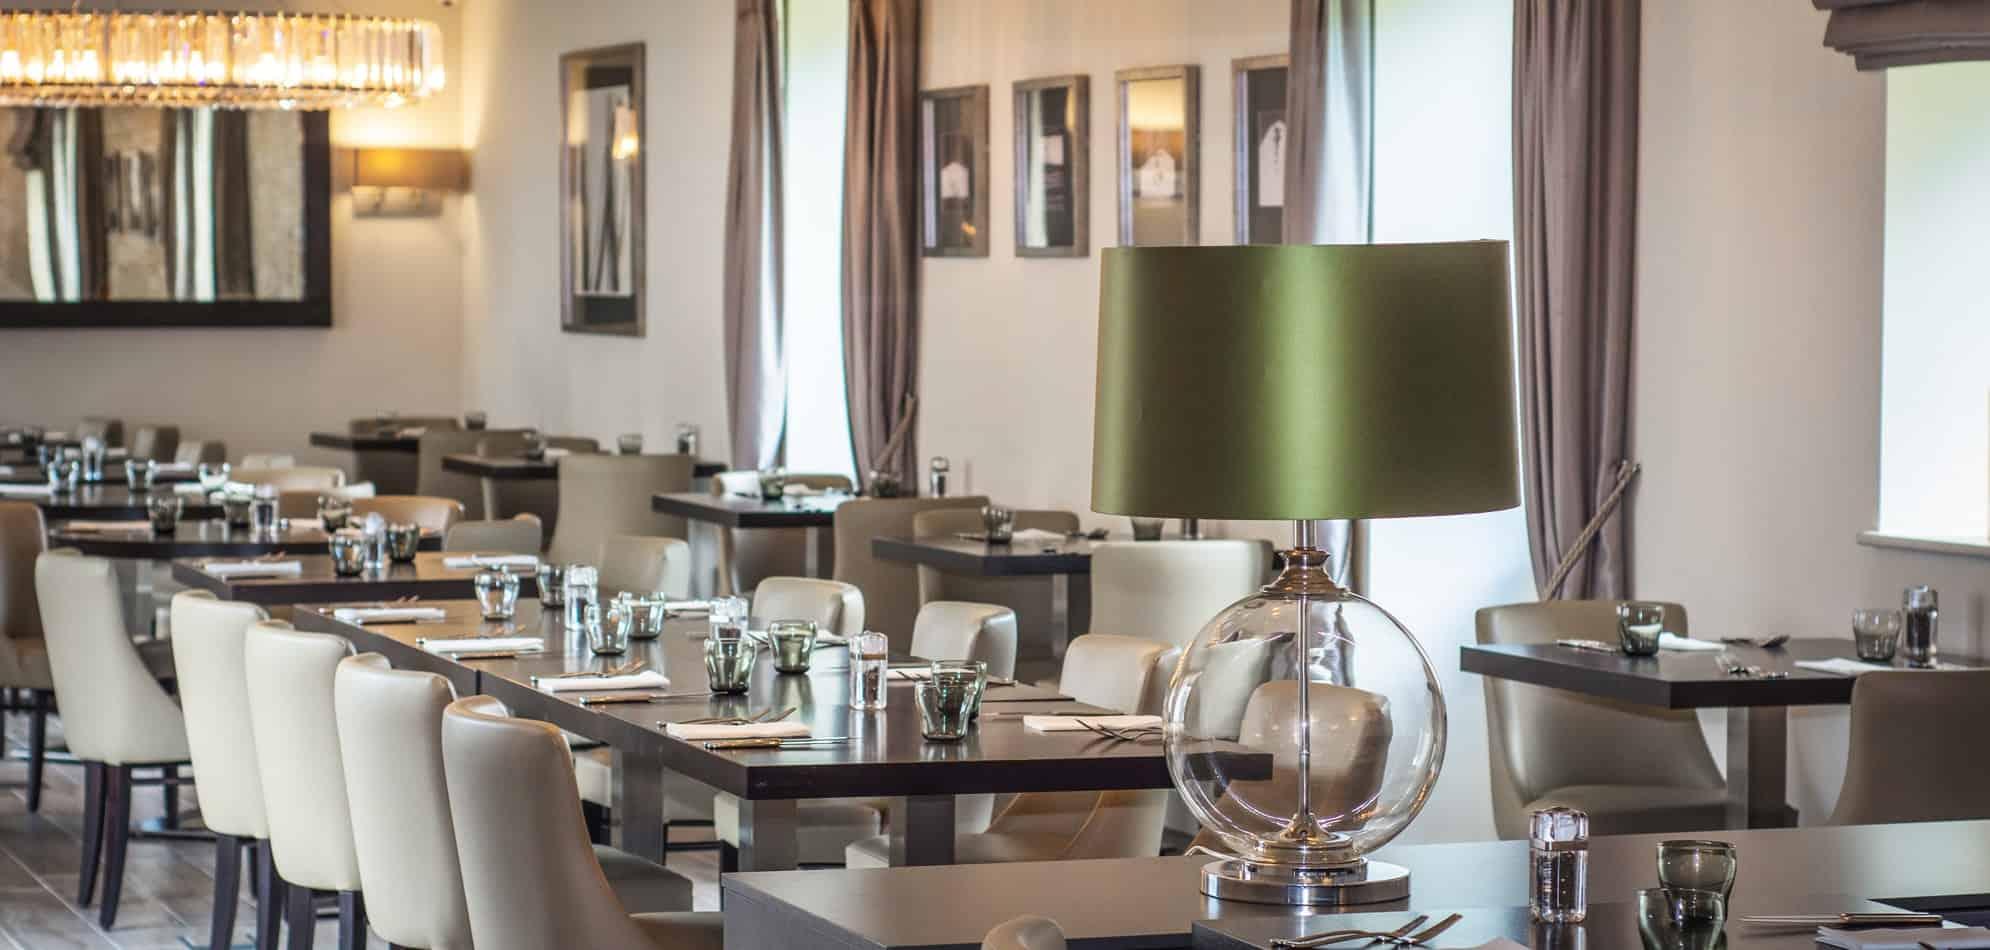 Monadh Dining Restaurant at Dunalastair Hotel3